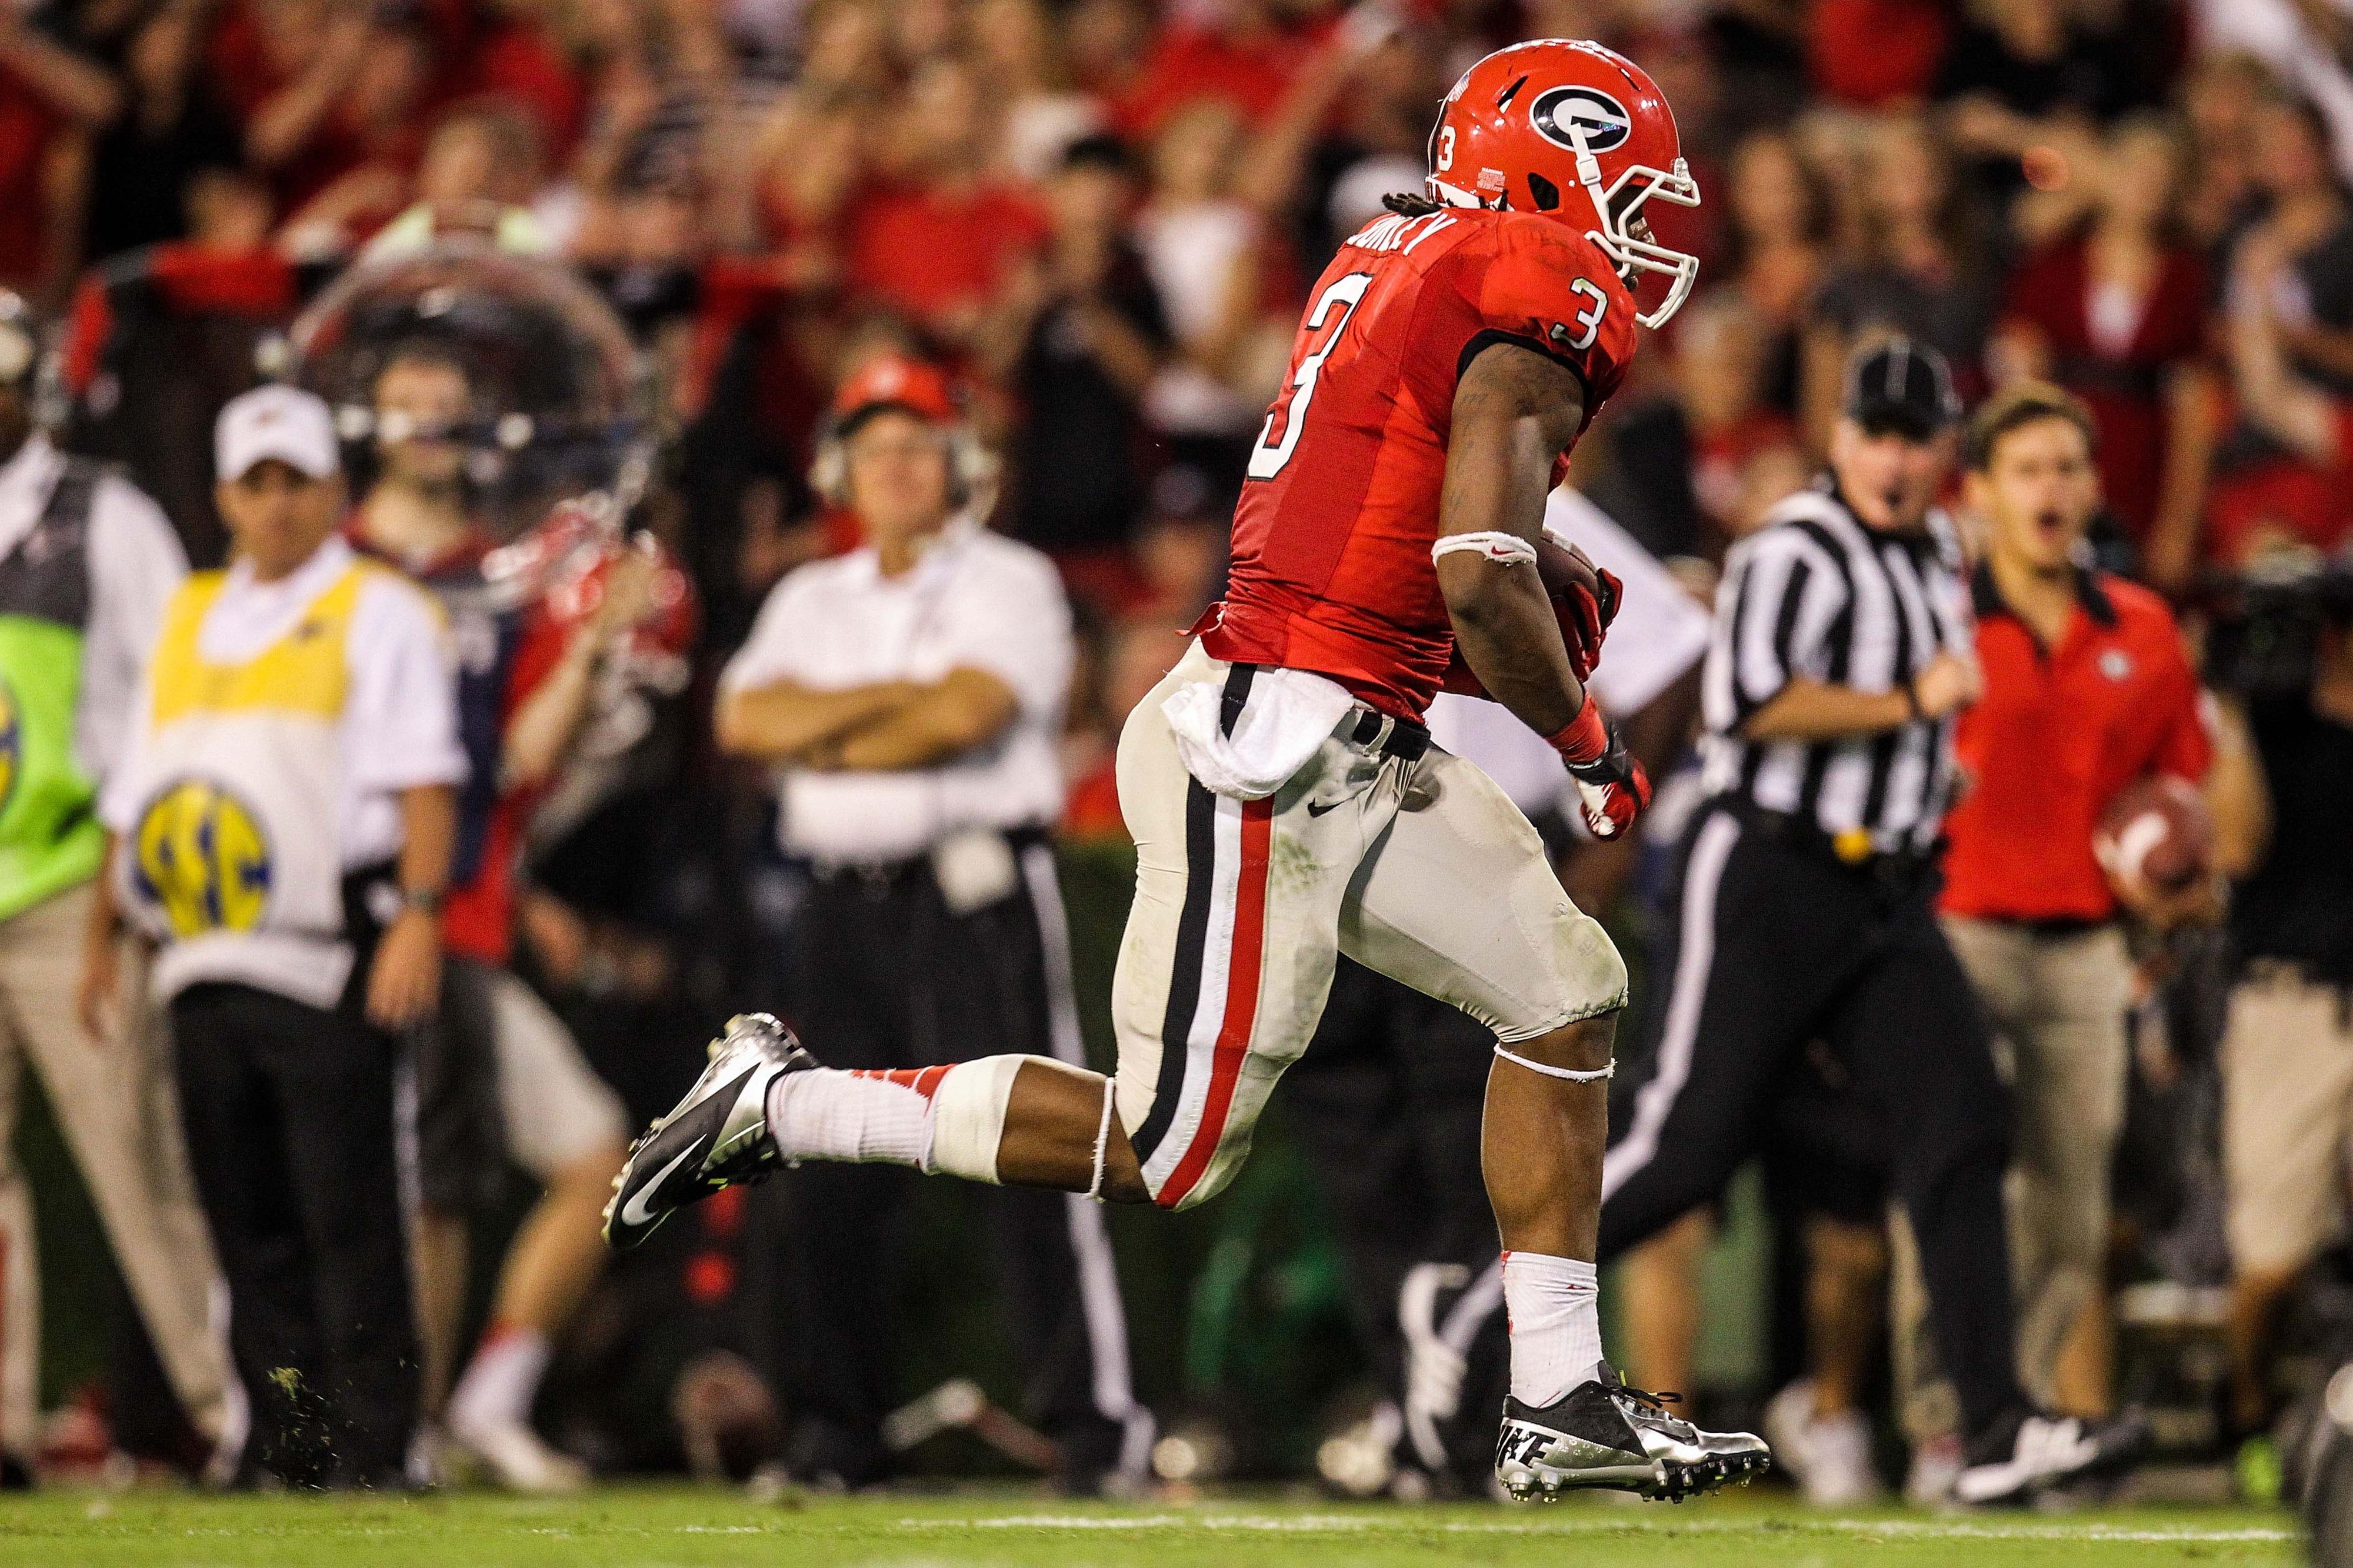 September 22, 2012; Athens, GA, USA; Georgia Bulldogs running back Todd Gurley (3) scores a touchdown in the second half against the Vanderbilt Commodores at Sanford Stadium. Georgia won 48-3. Mandatory Credit: Daniel Shirey-US PRESSWIRE